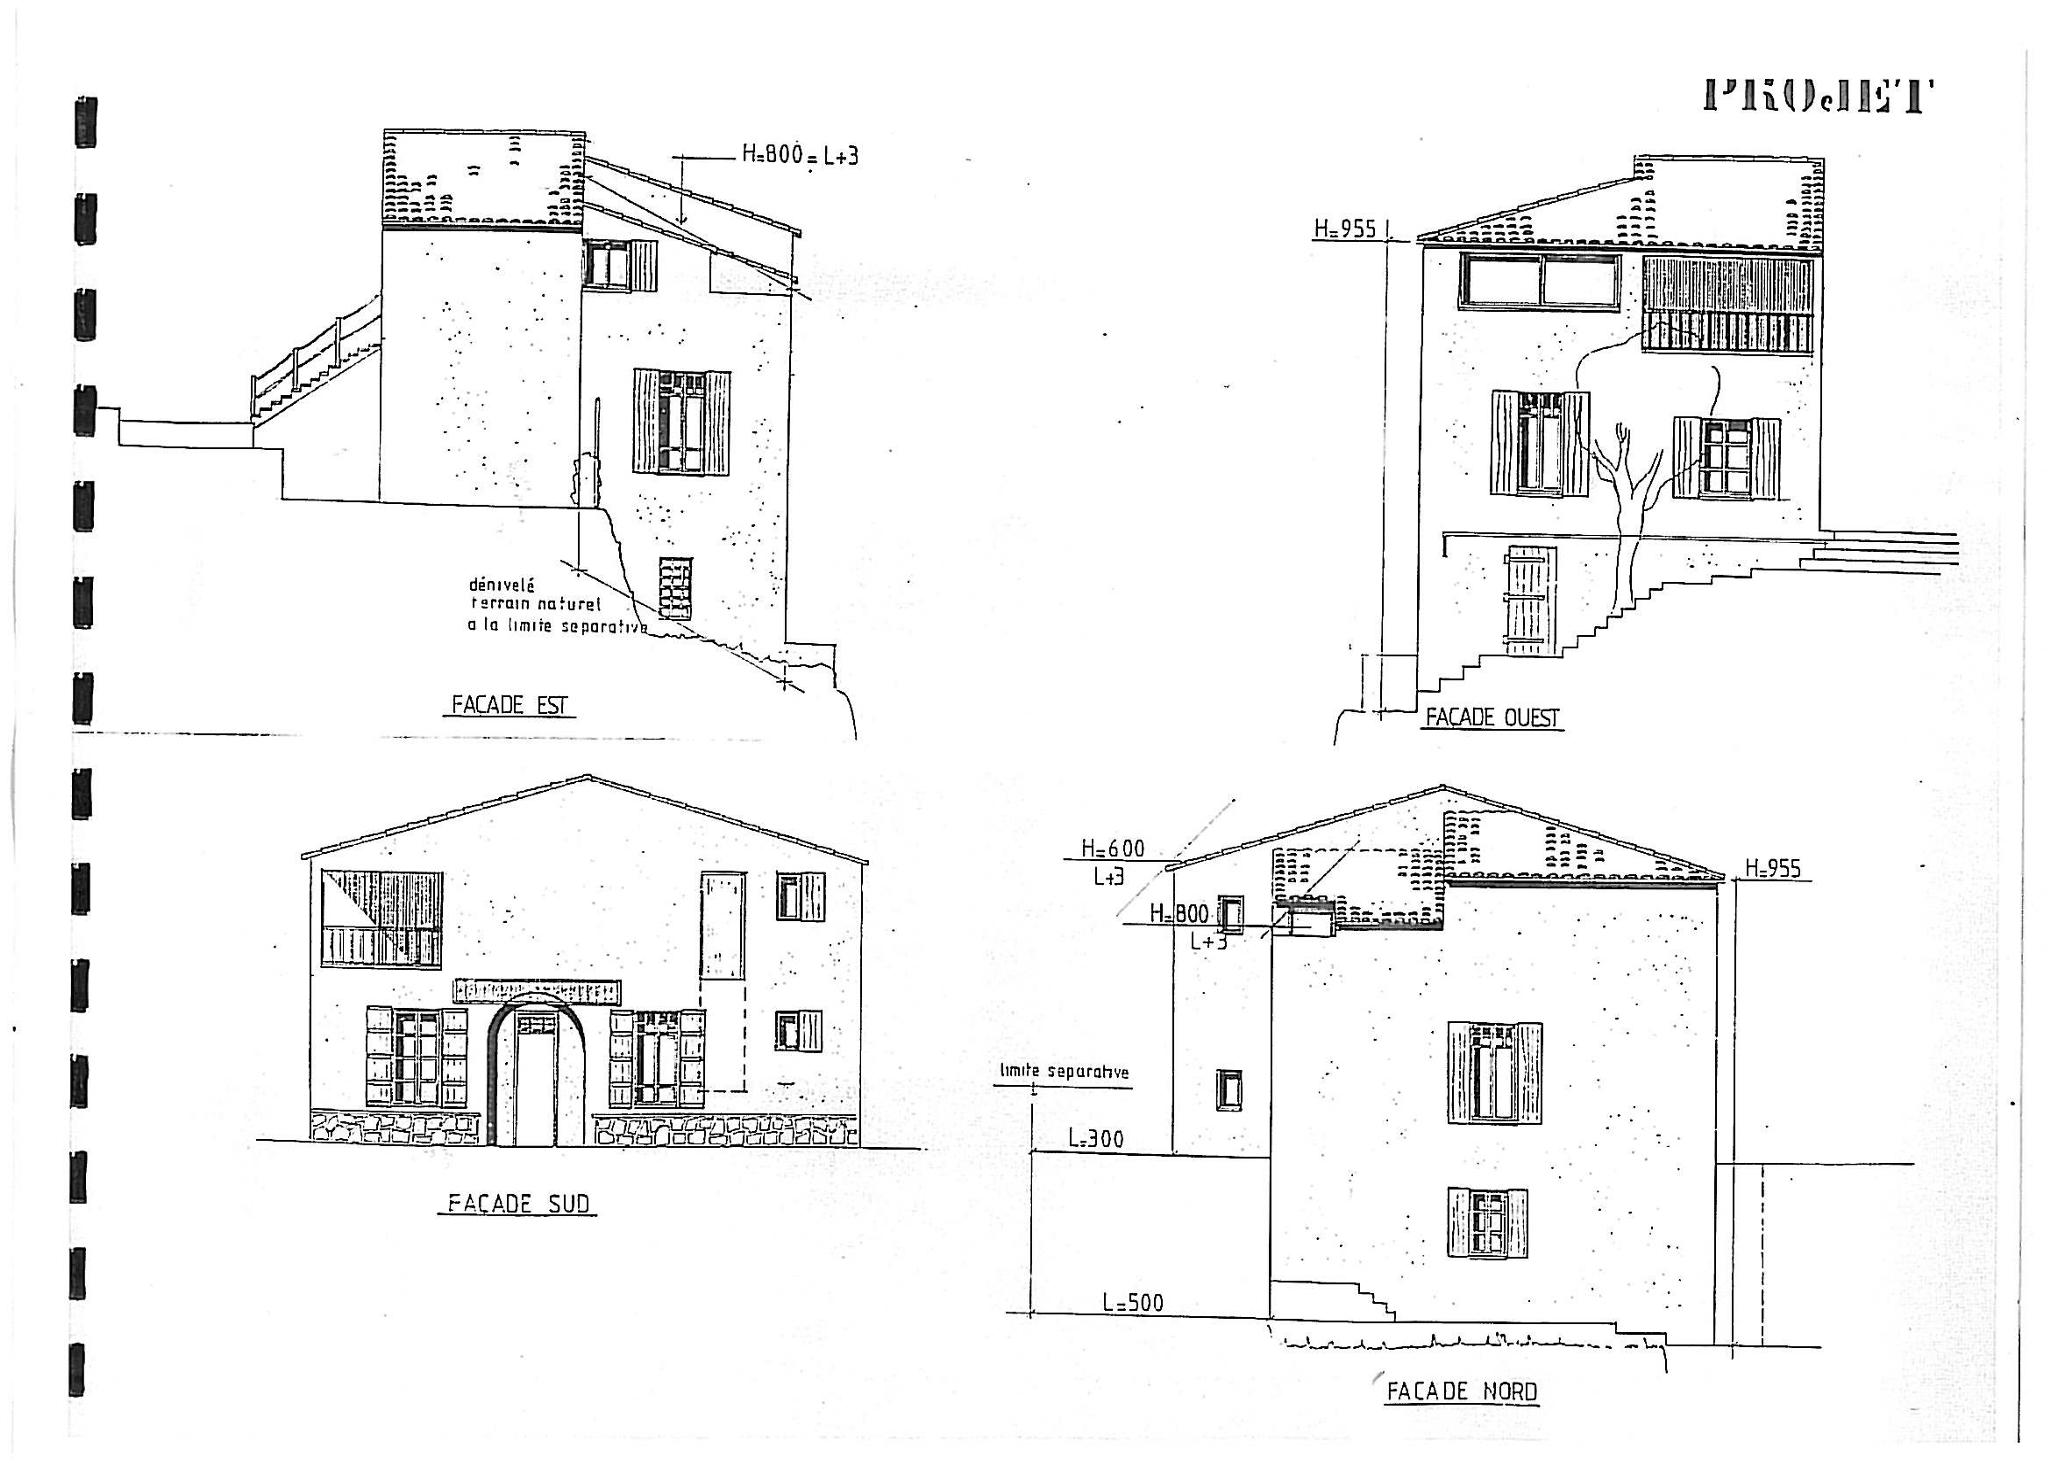 plan-de-facade-du-projet